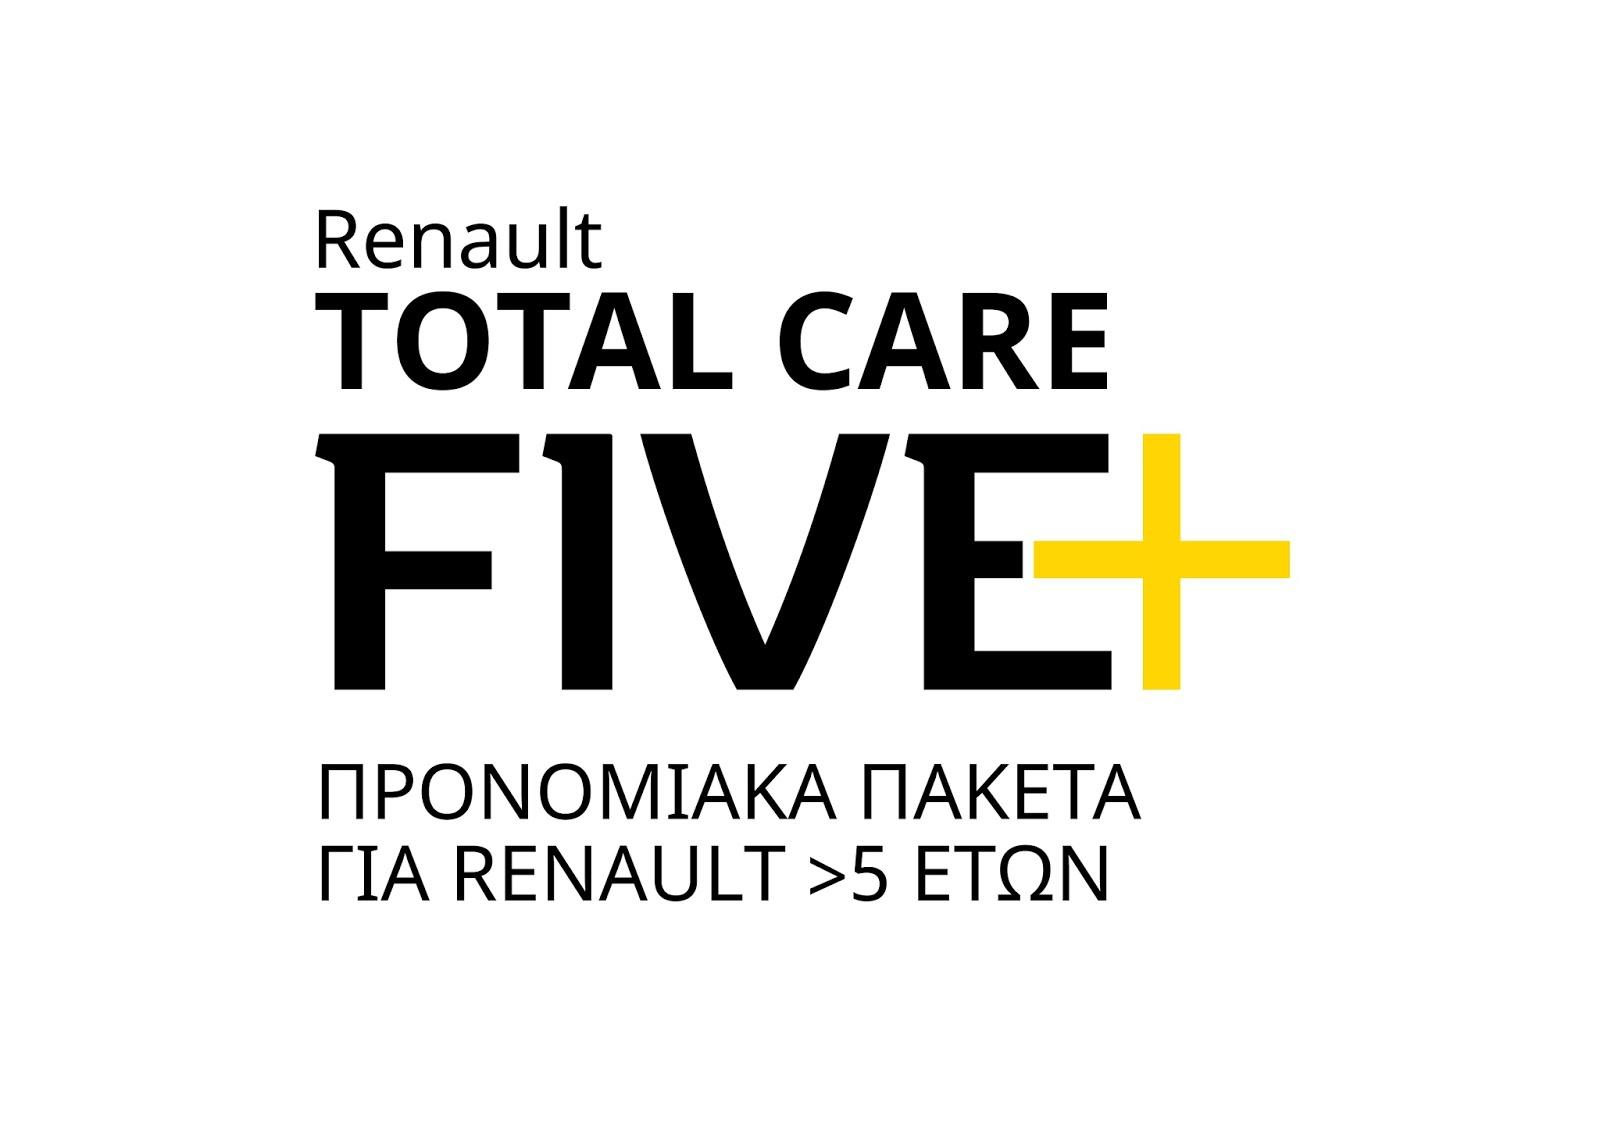 RENAULT%2BFIVE%2BPLUS 02 Όλοι οι κάτοχοι Renault 5 ετών και άνω μπορούν να το ελέγξουν εντελώς δωρεάν